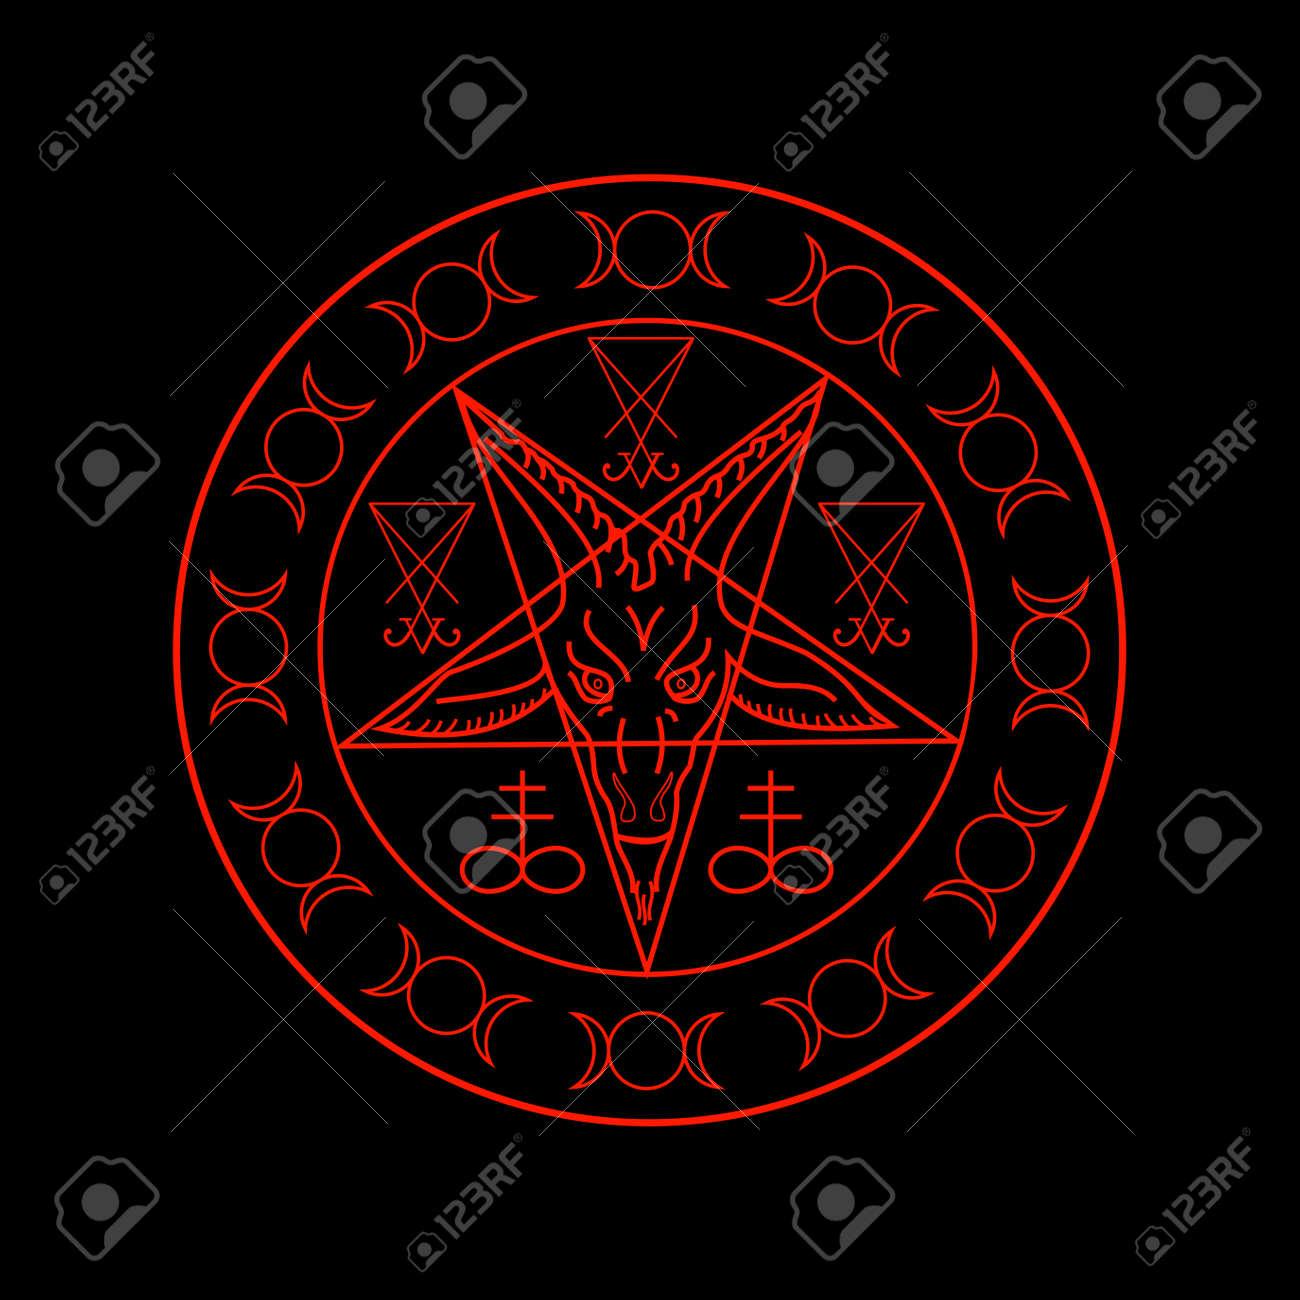 Wiccan symbols- Cross of Sulfur, Triple Goddess, Sigil of Baphomet